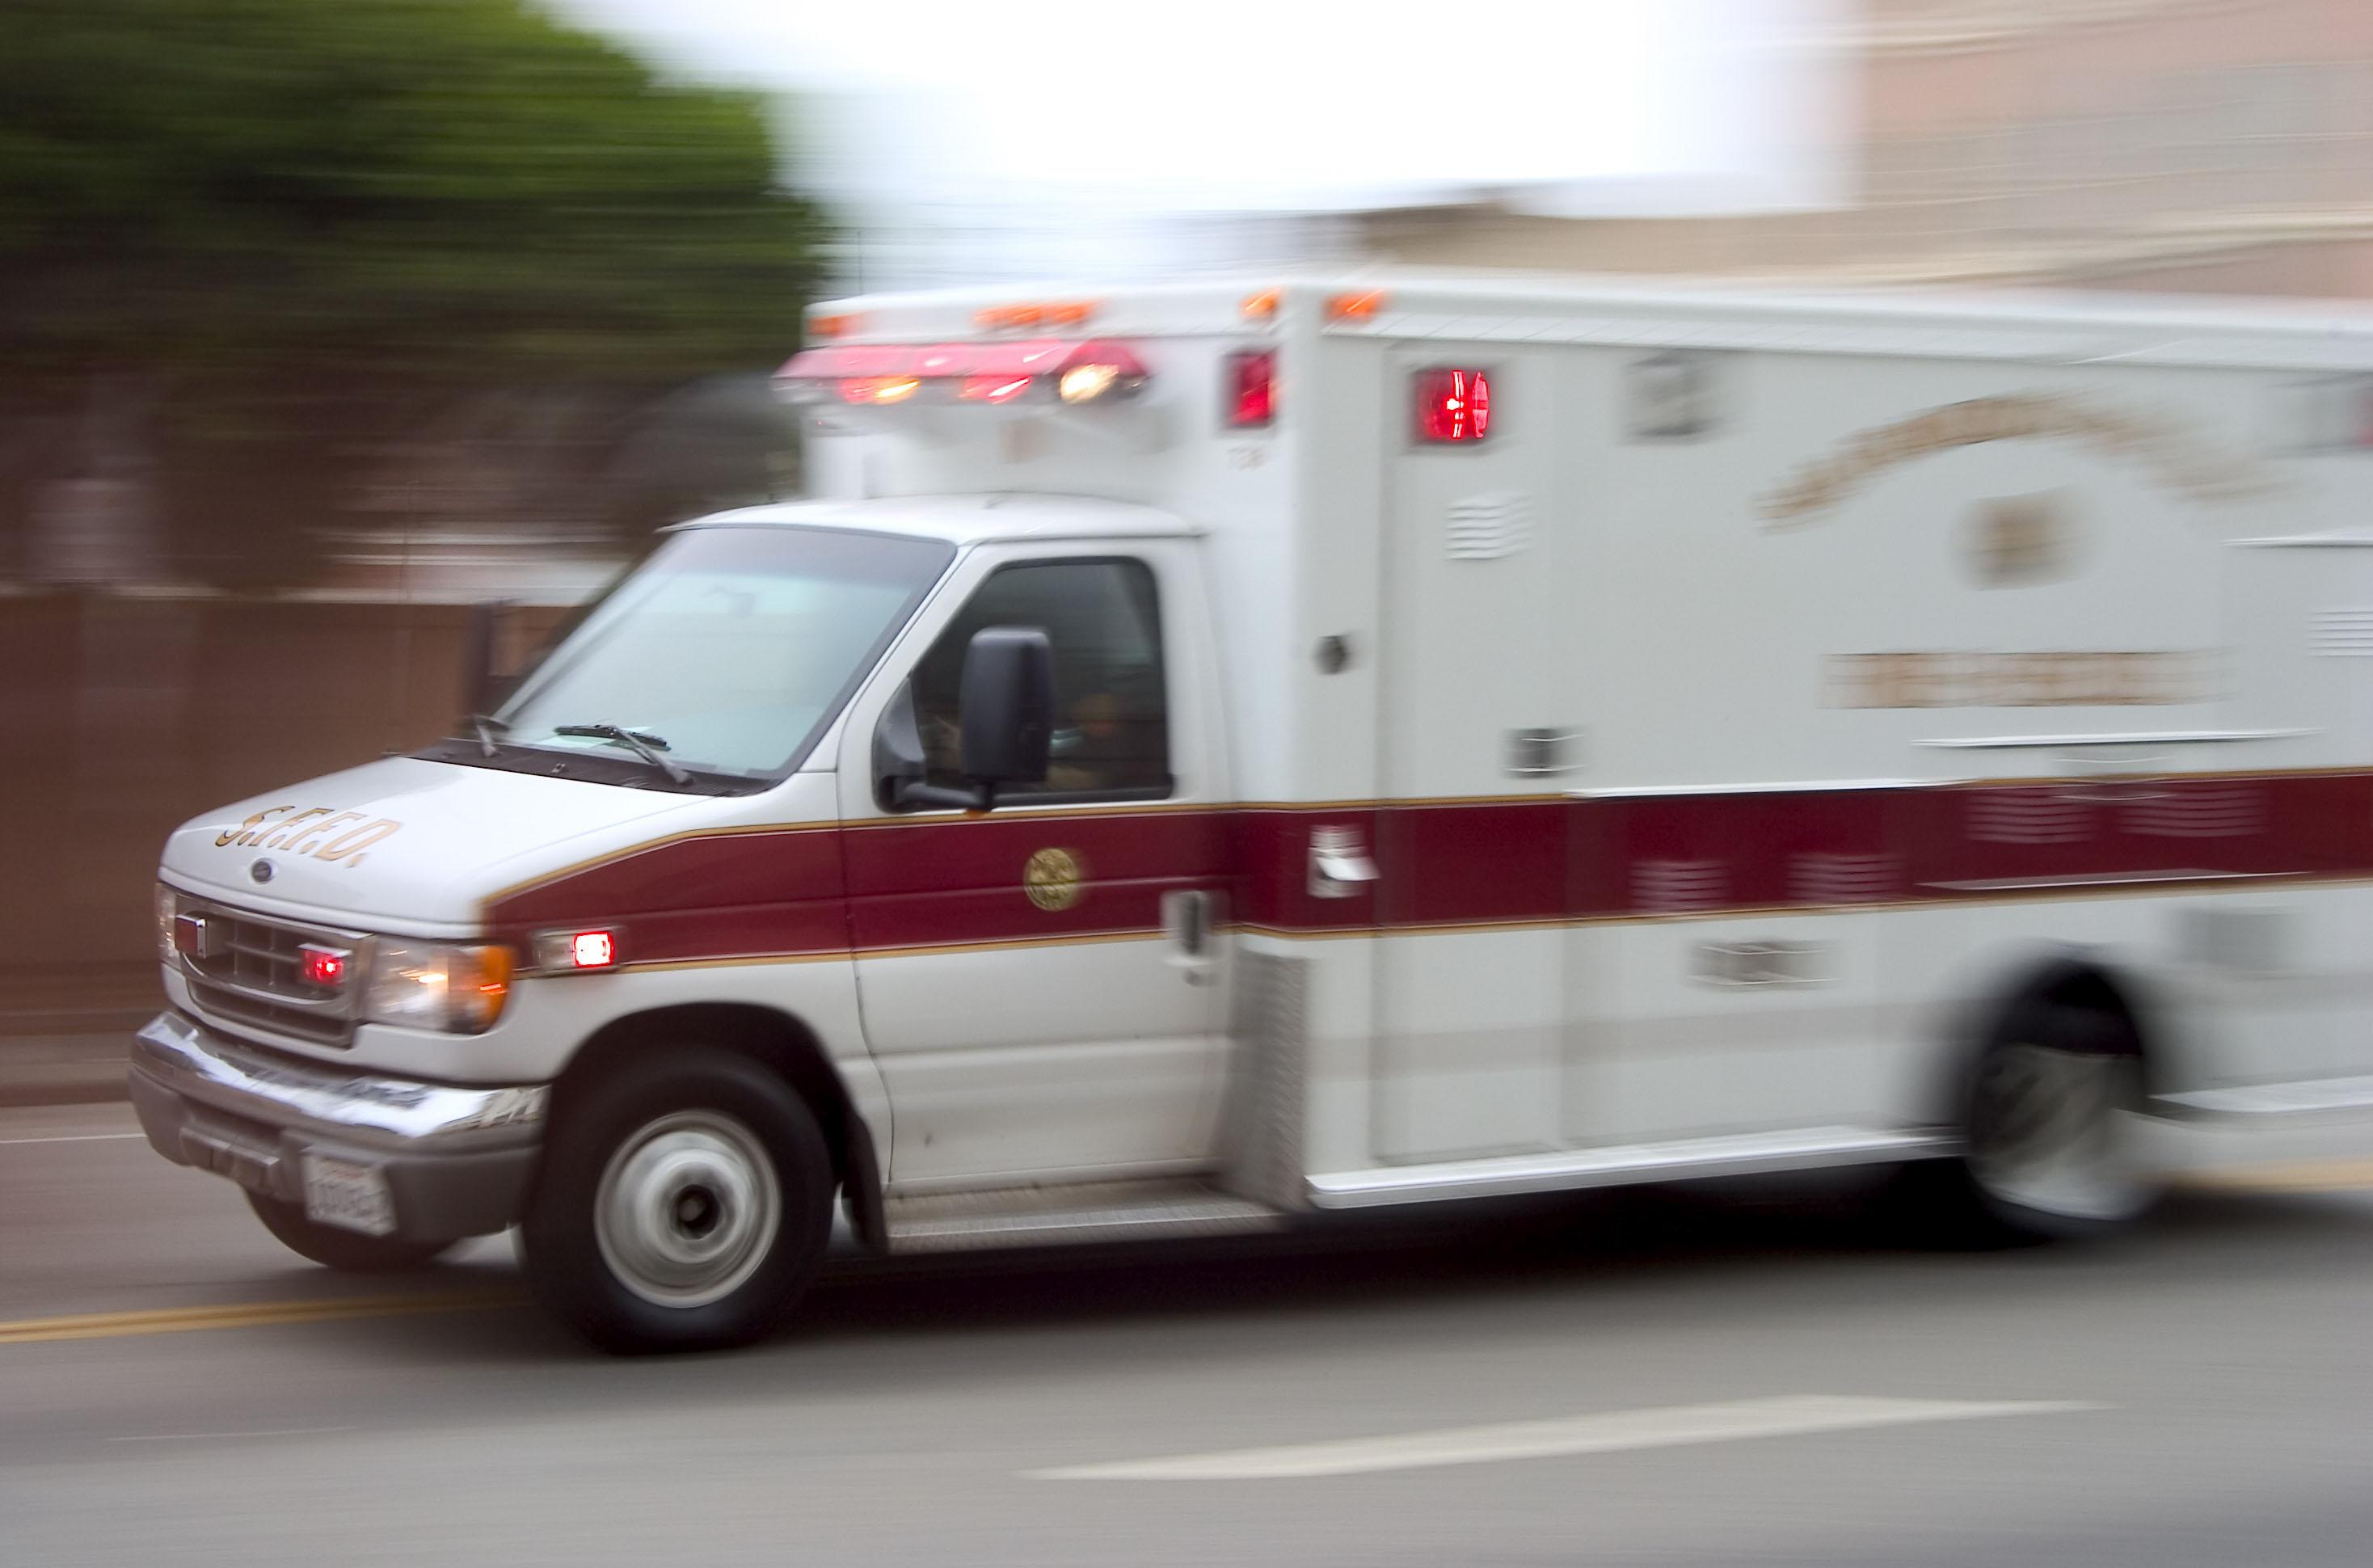 Three Vehicle Crash Tuesday night at Rt. 17 and Vincennes